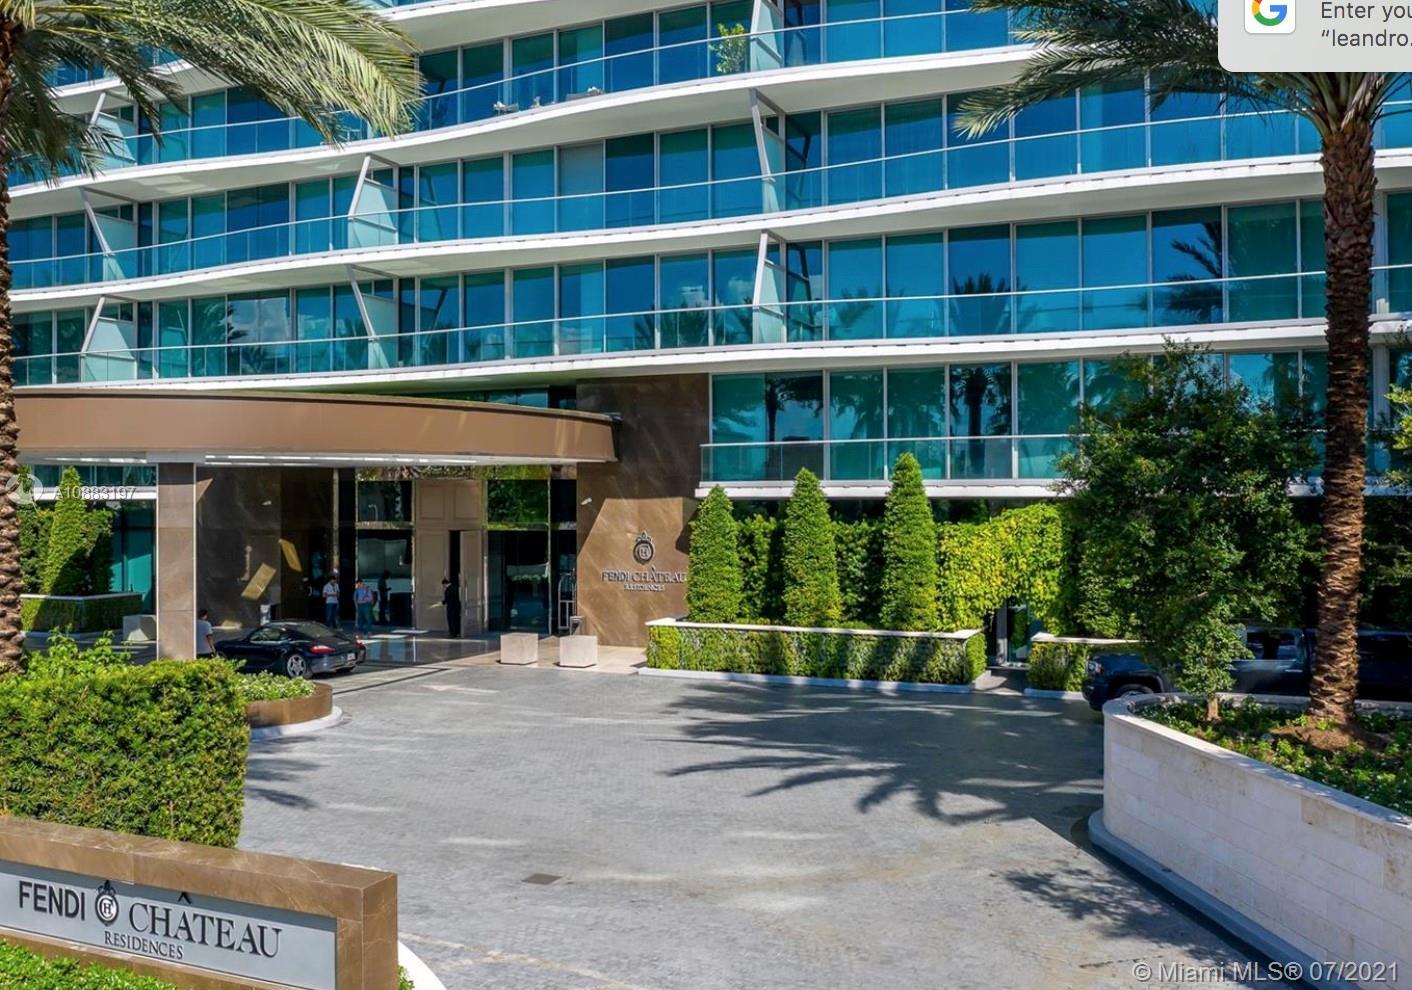 FENDI Chateau Residences, 9349 Collins Ave Unit 506, Surfside, Florida 33154, image 1